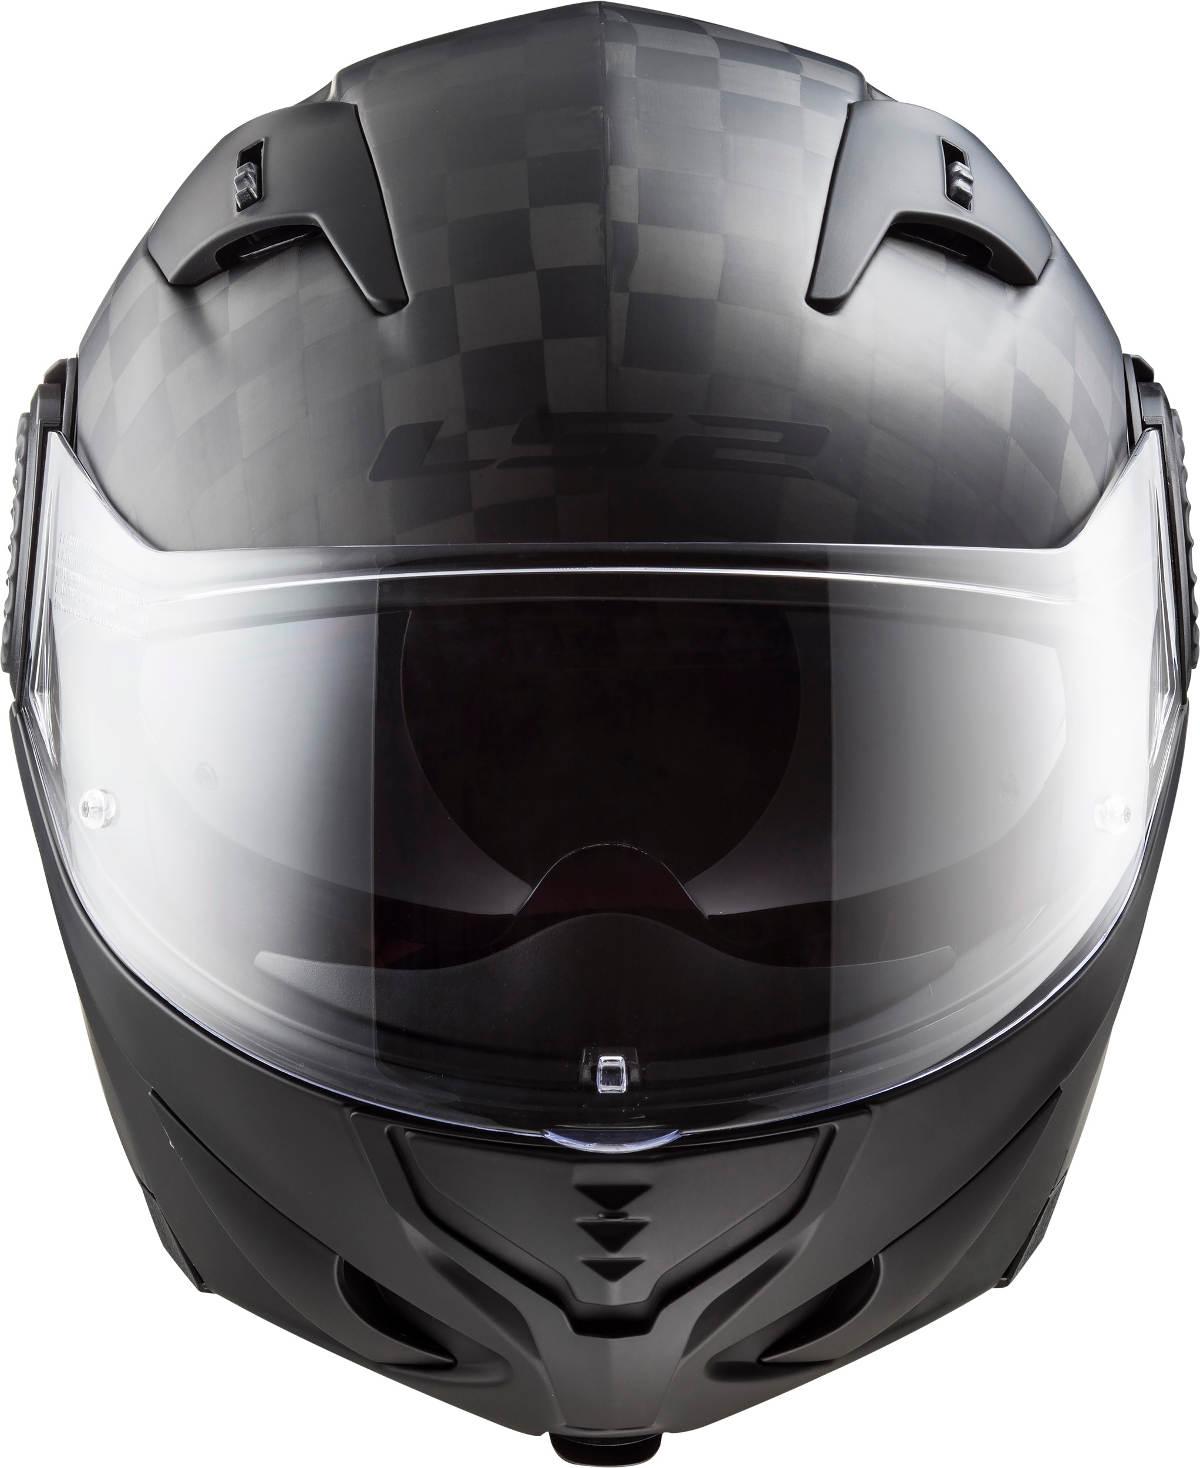 LS2 Vortex Carbon Fibre Modular Motorcycle Helmet Front